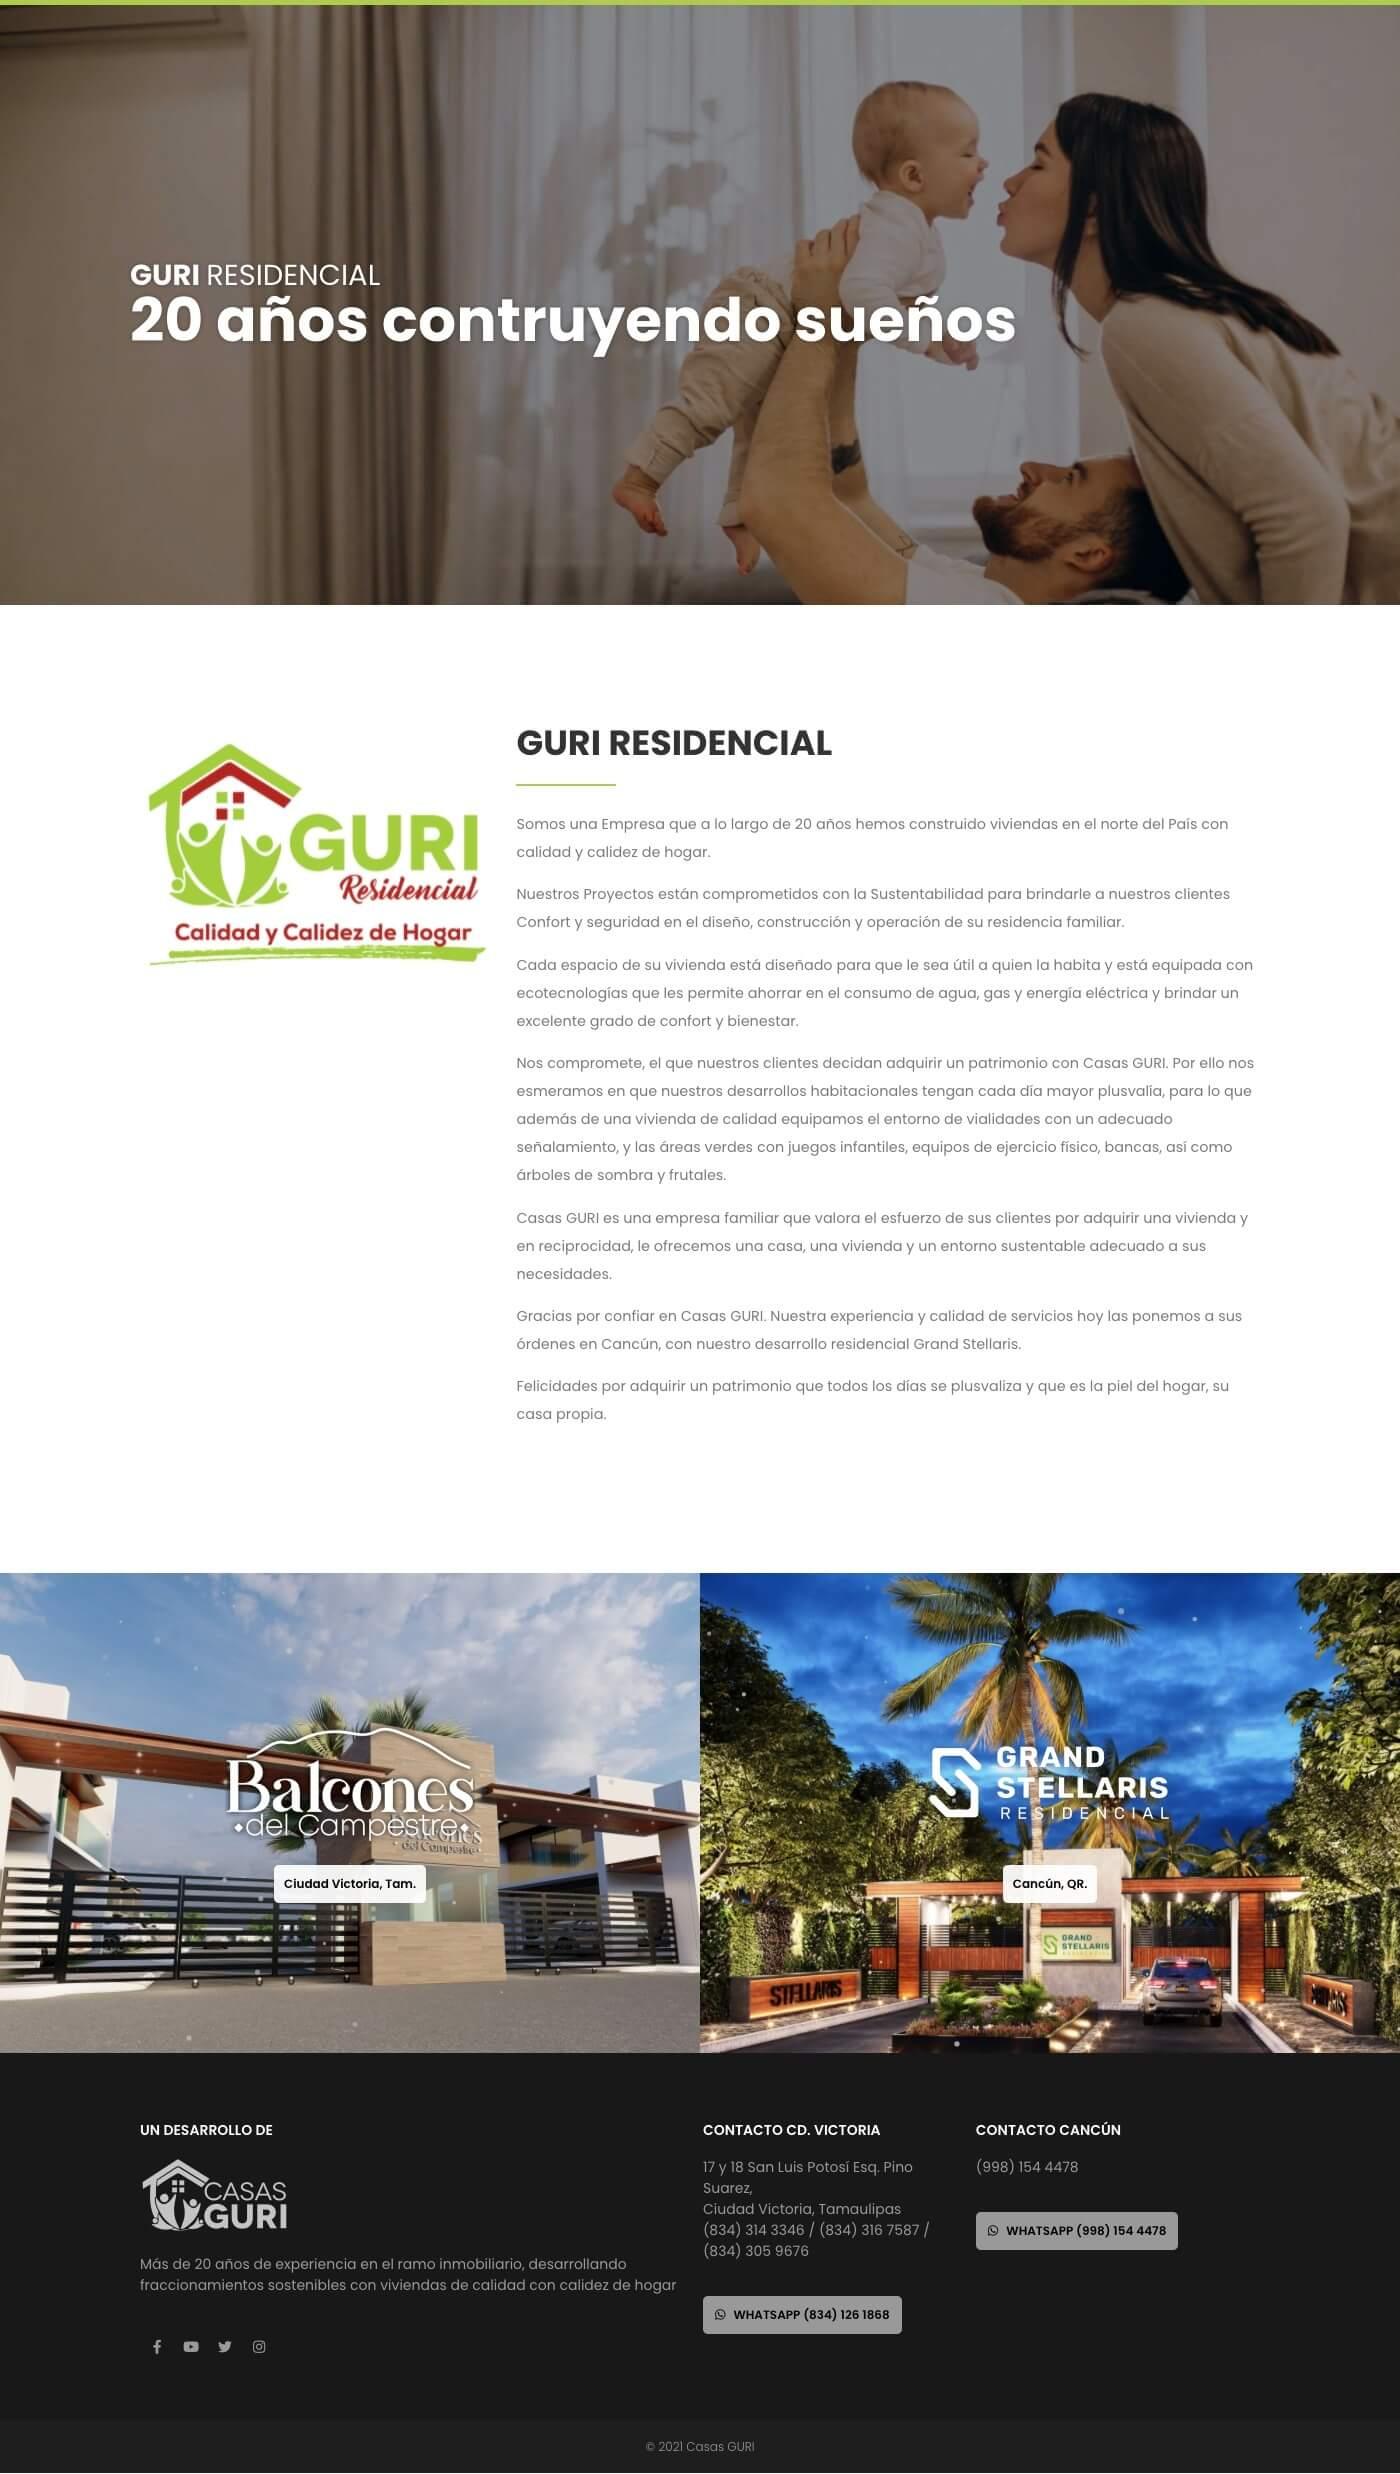 Guriresidencial - Home